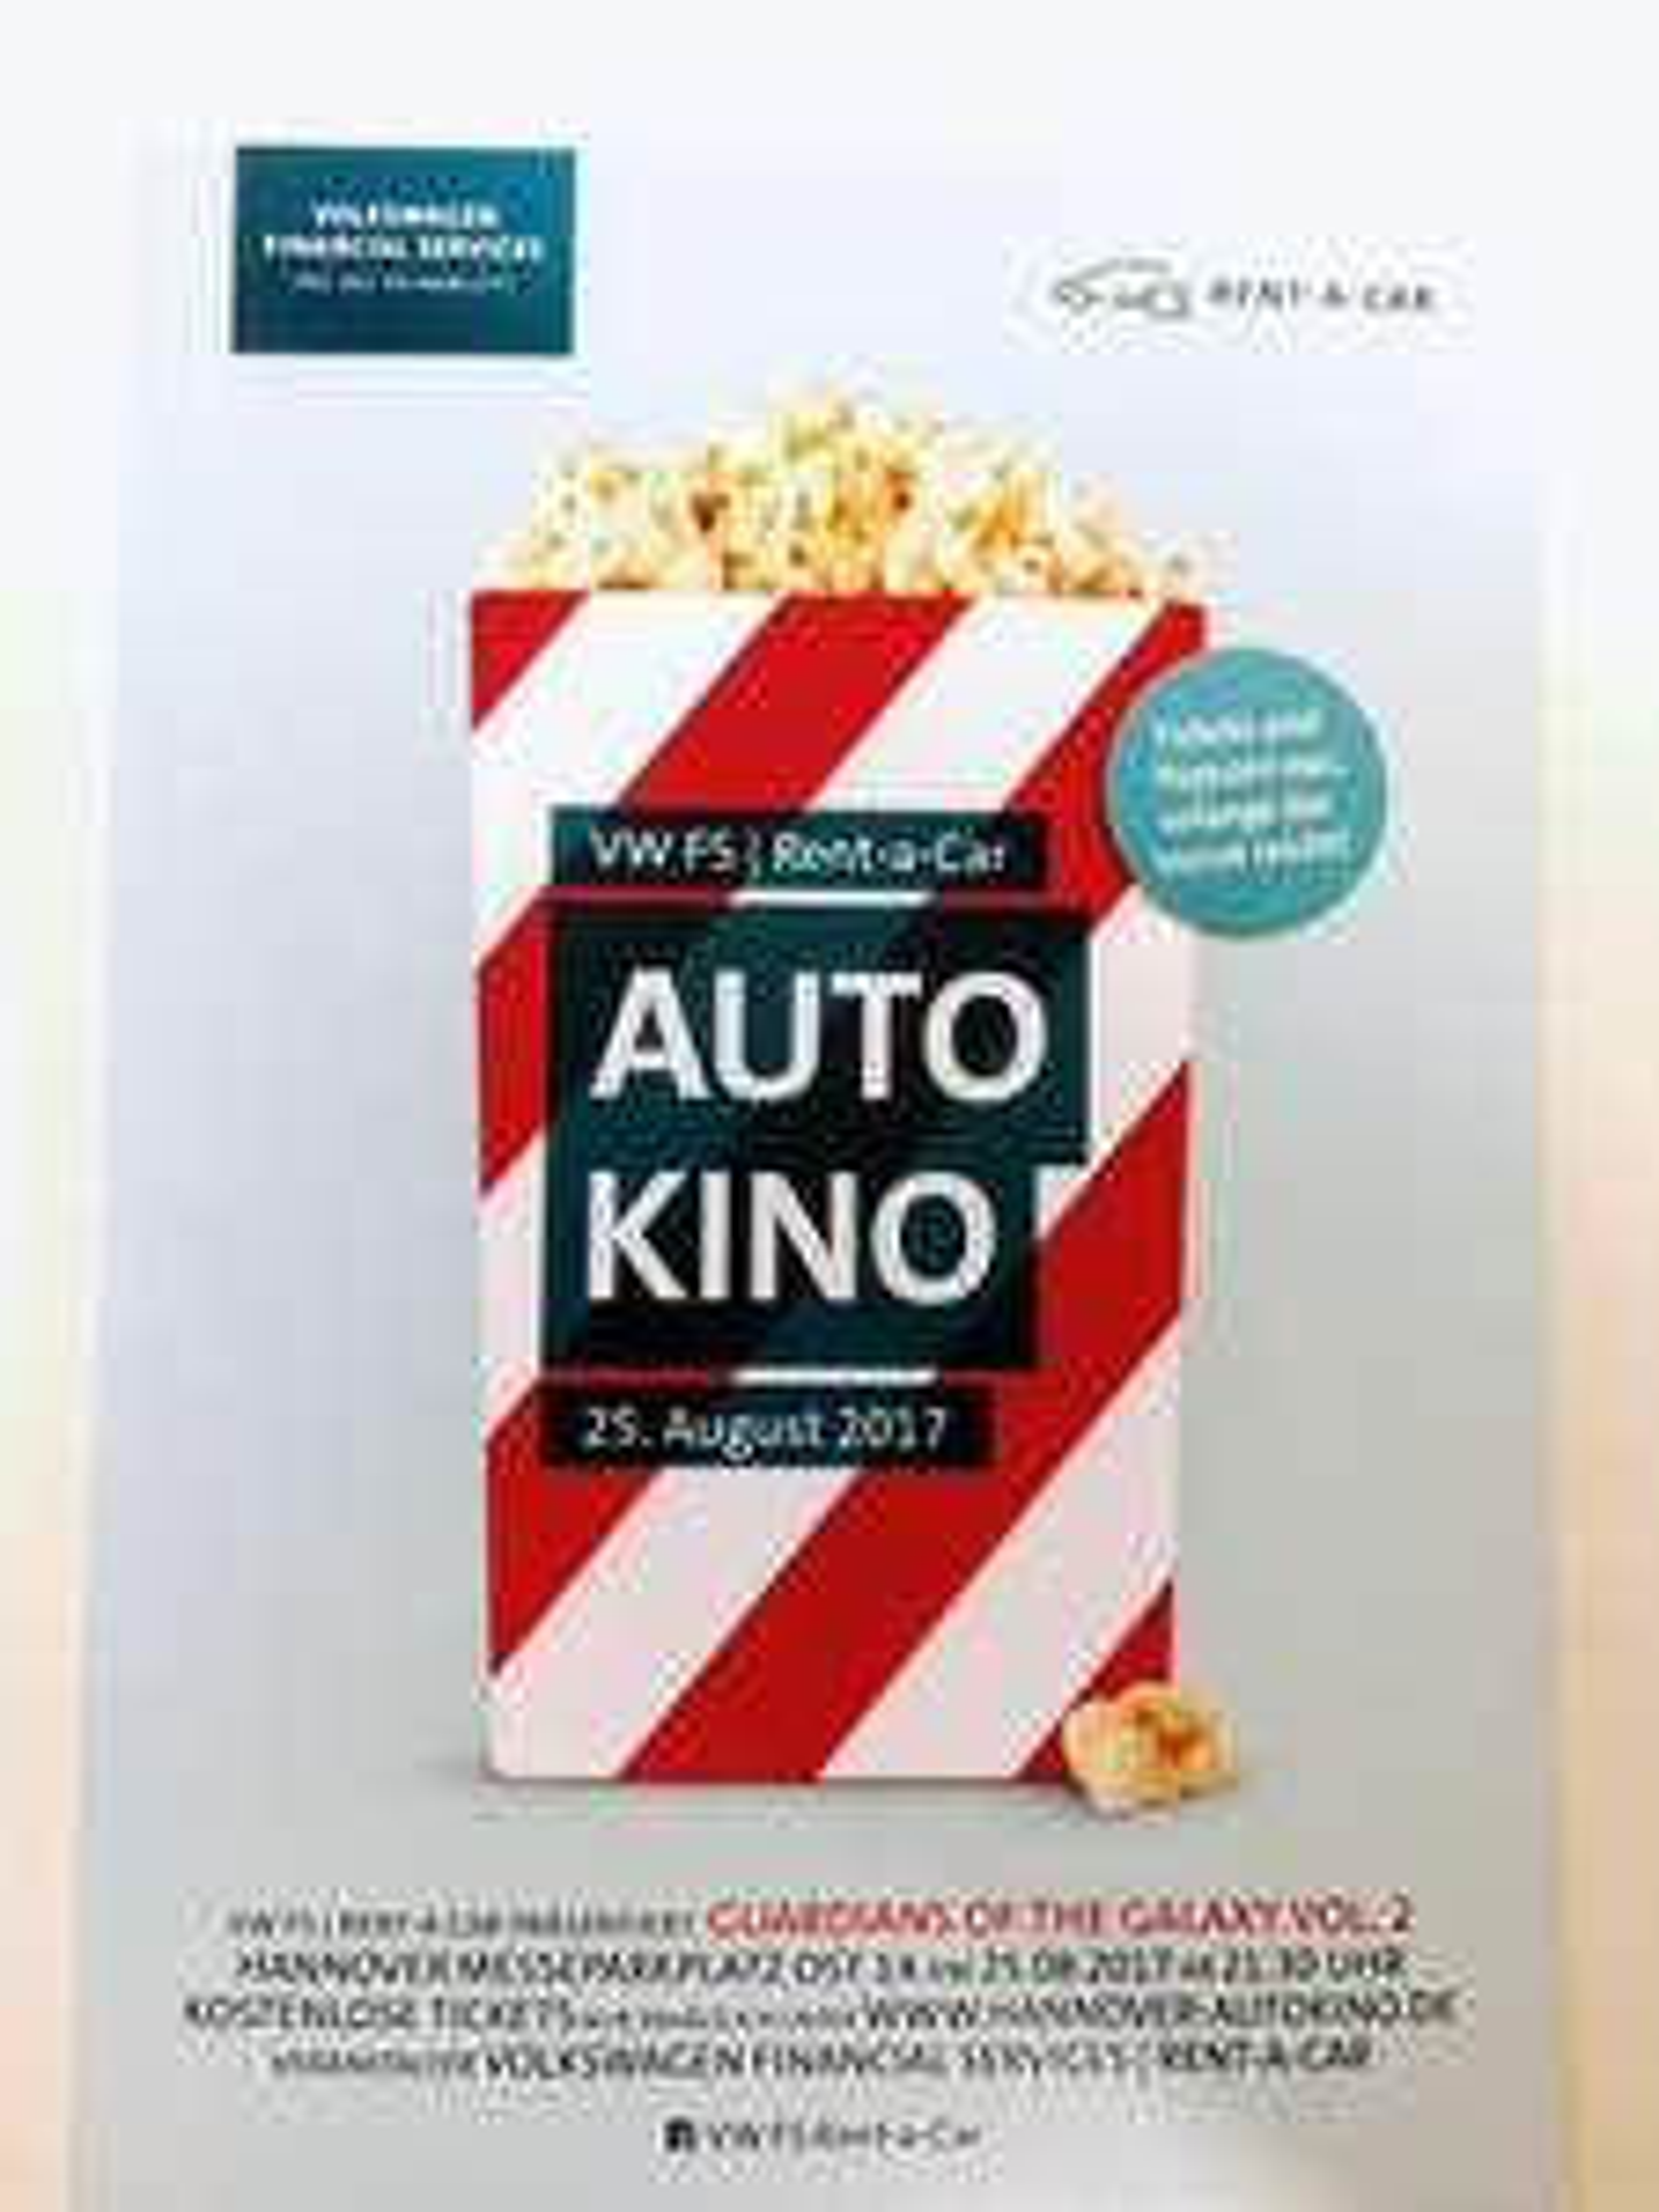 [Hannover] Autokino for free mit kostenlosem Popcorn und Guardians of the Galaxy 2 am 25.8.17